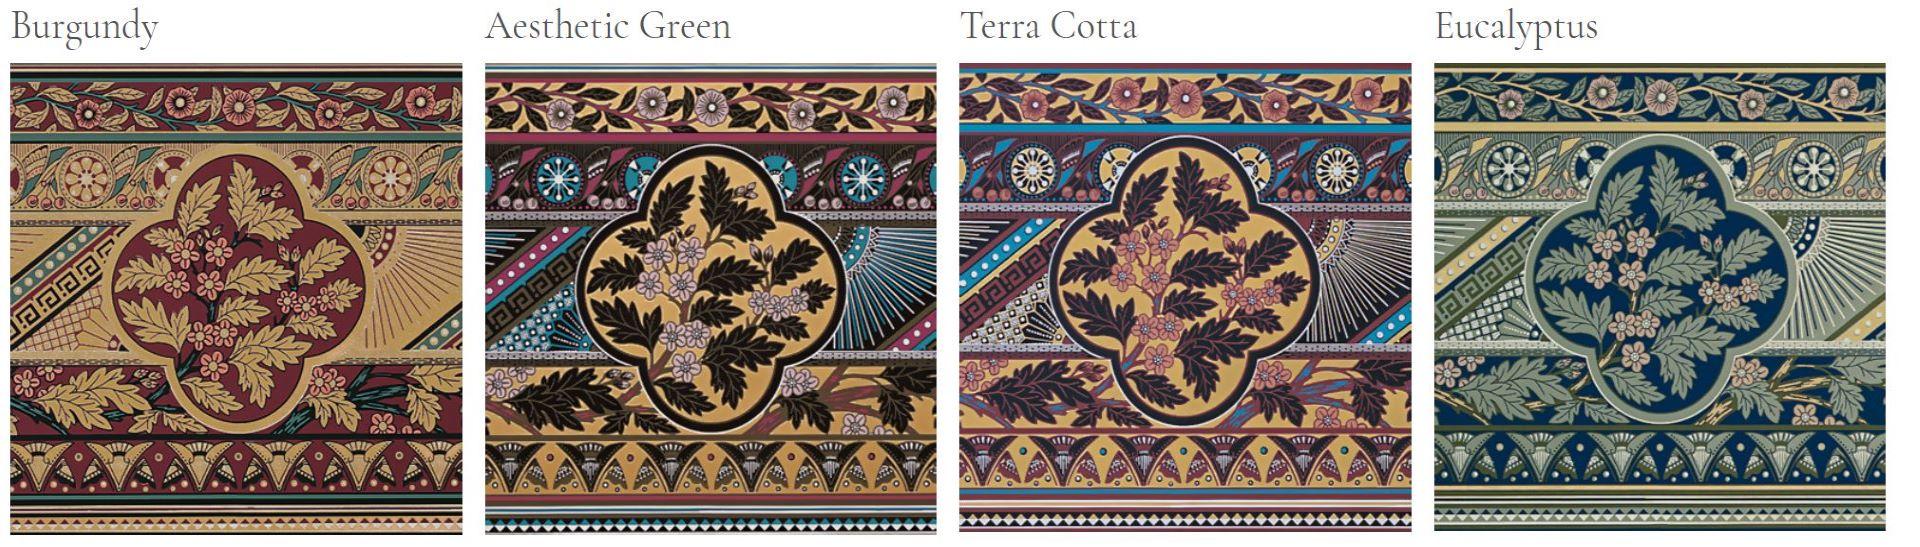 Leaf-print wallpaper motifs in burgundy, green, mint and terra cotta.